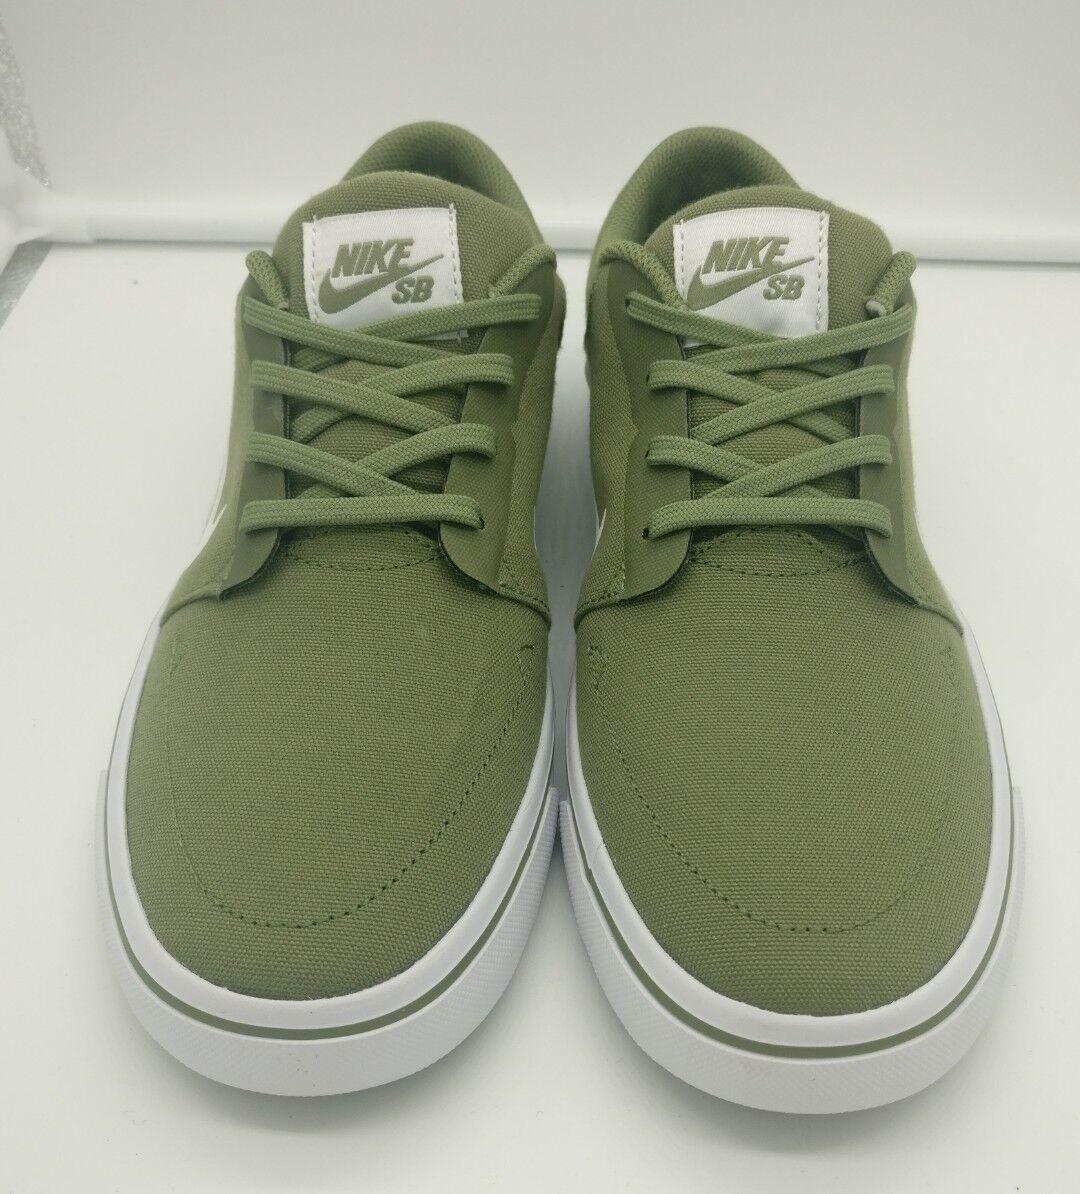 Nike sb portmore leinwand palmen grün - 723874311 weiße 723874311 - ad2c4d